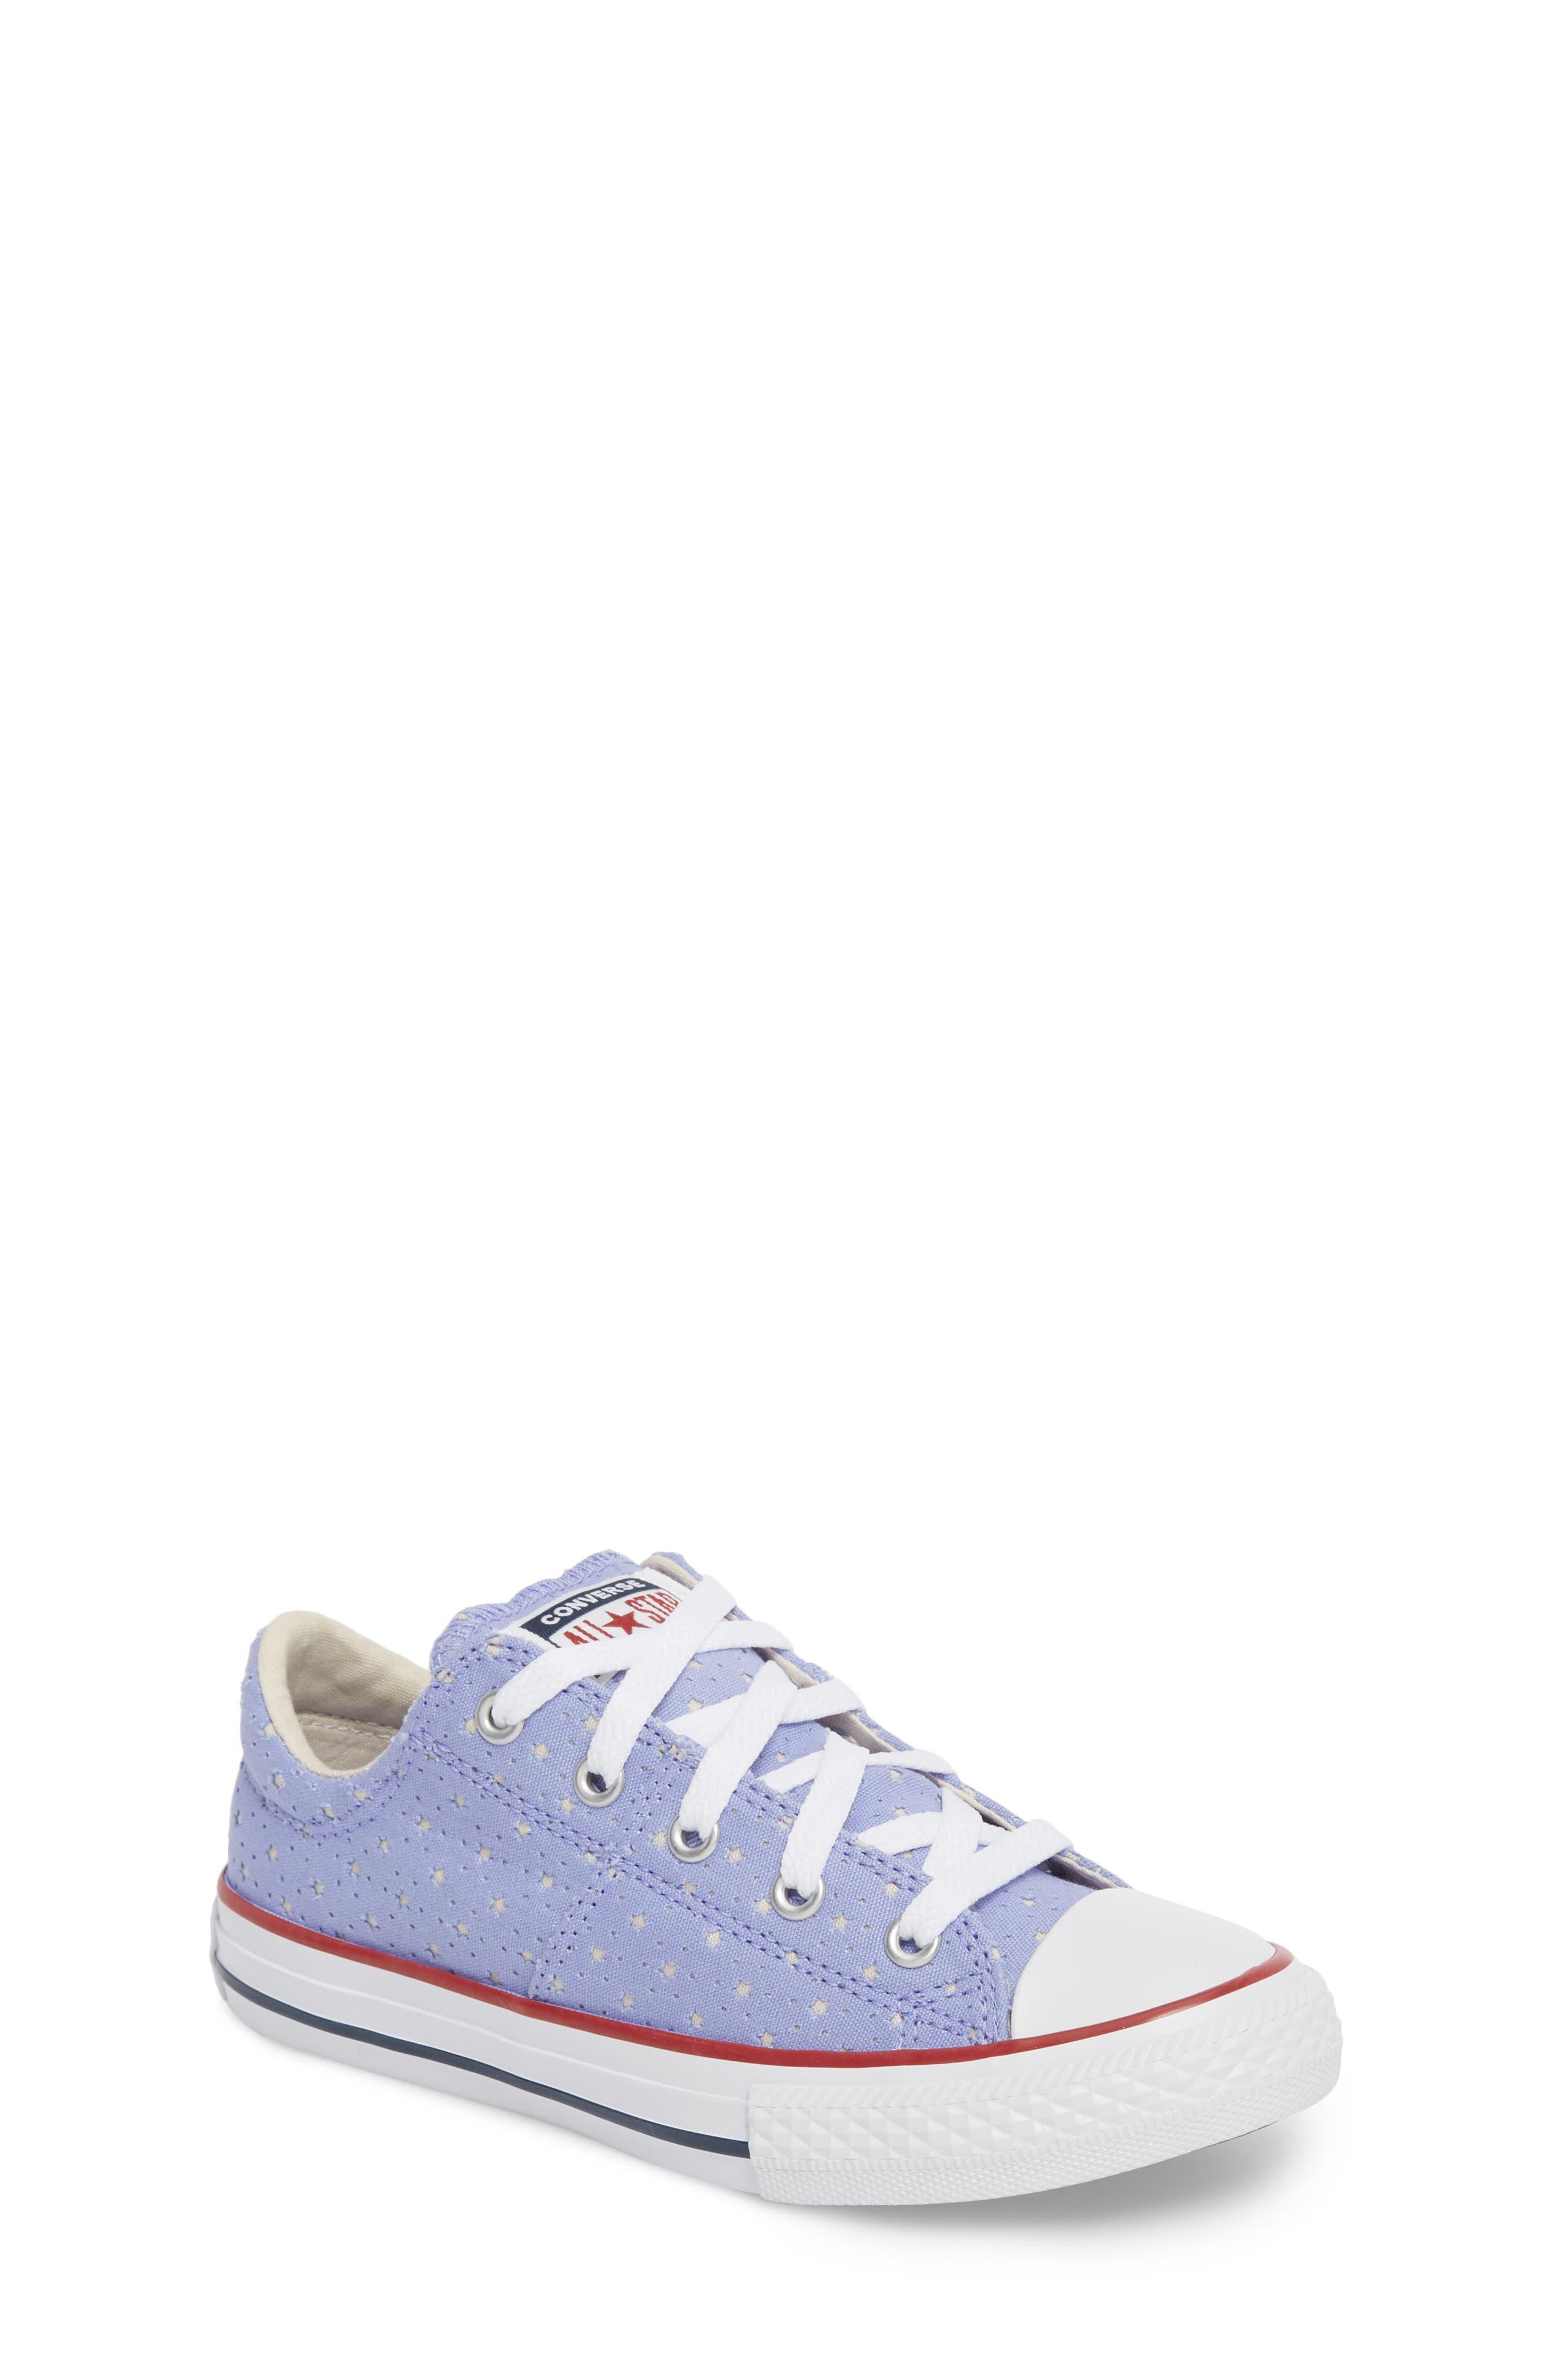 Chuck Taylor<sup>®</sup> All Star<sup>®</sup> Madison Sneaker,                             Main thumbnail 1, color,                             531